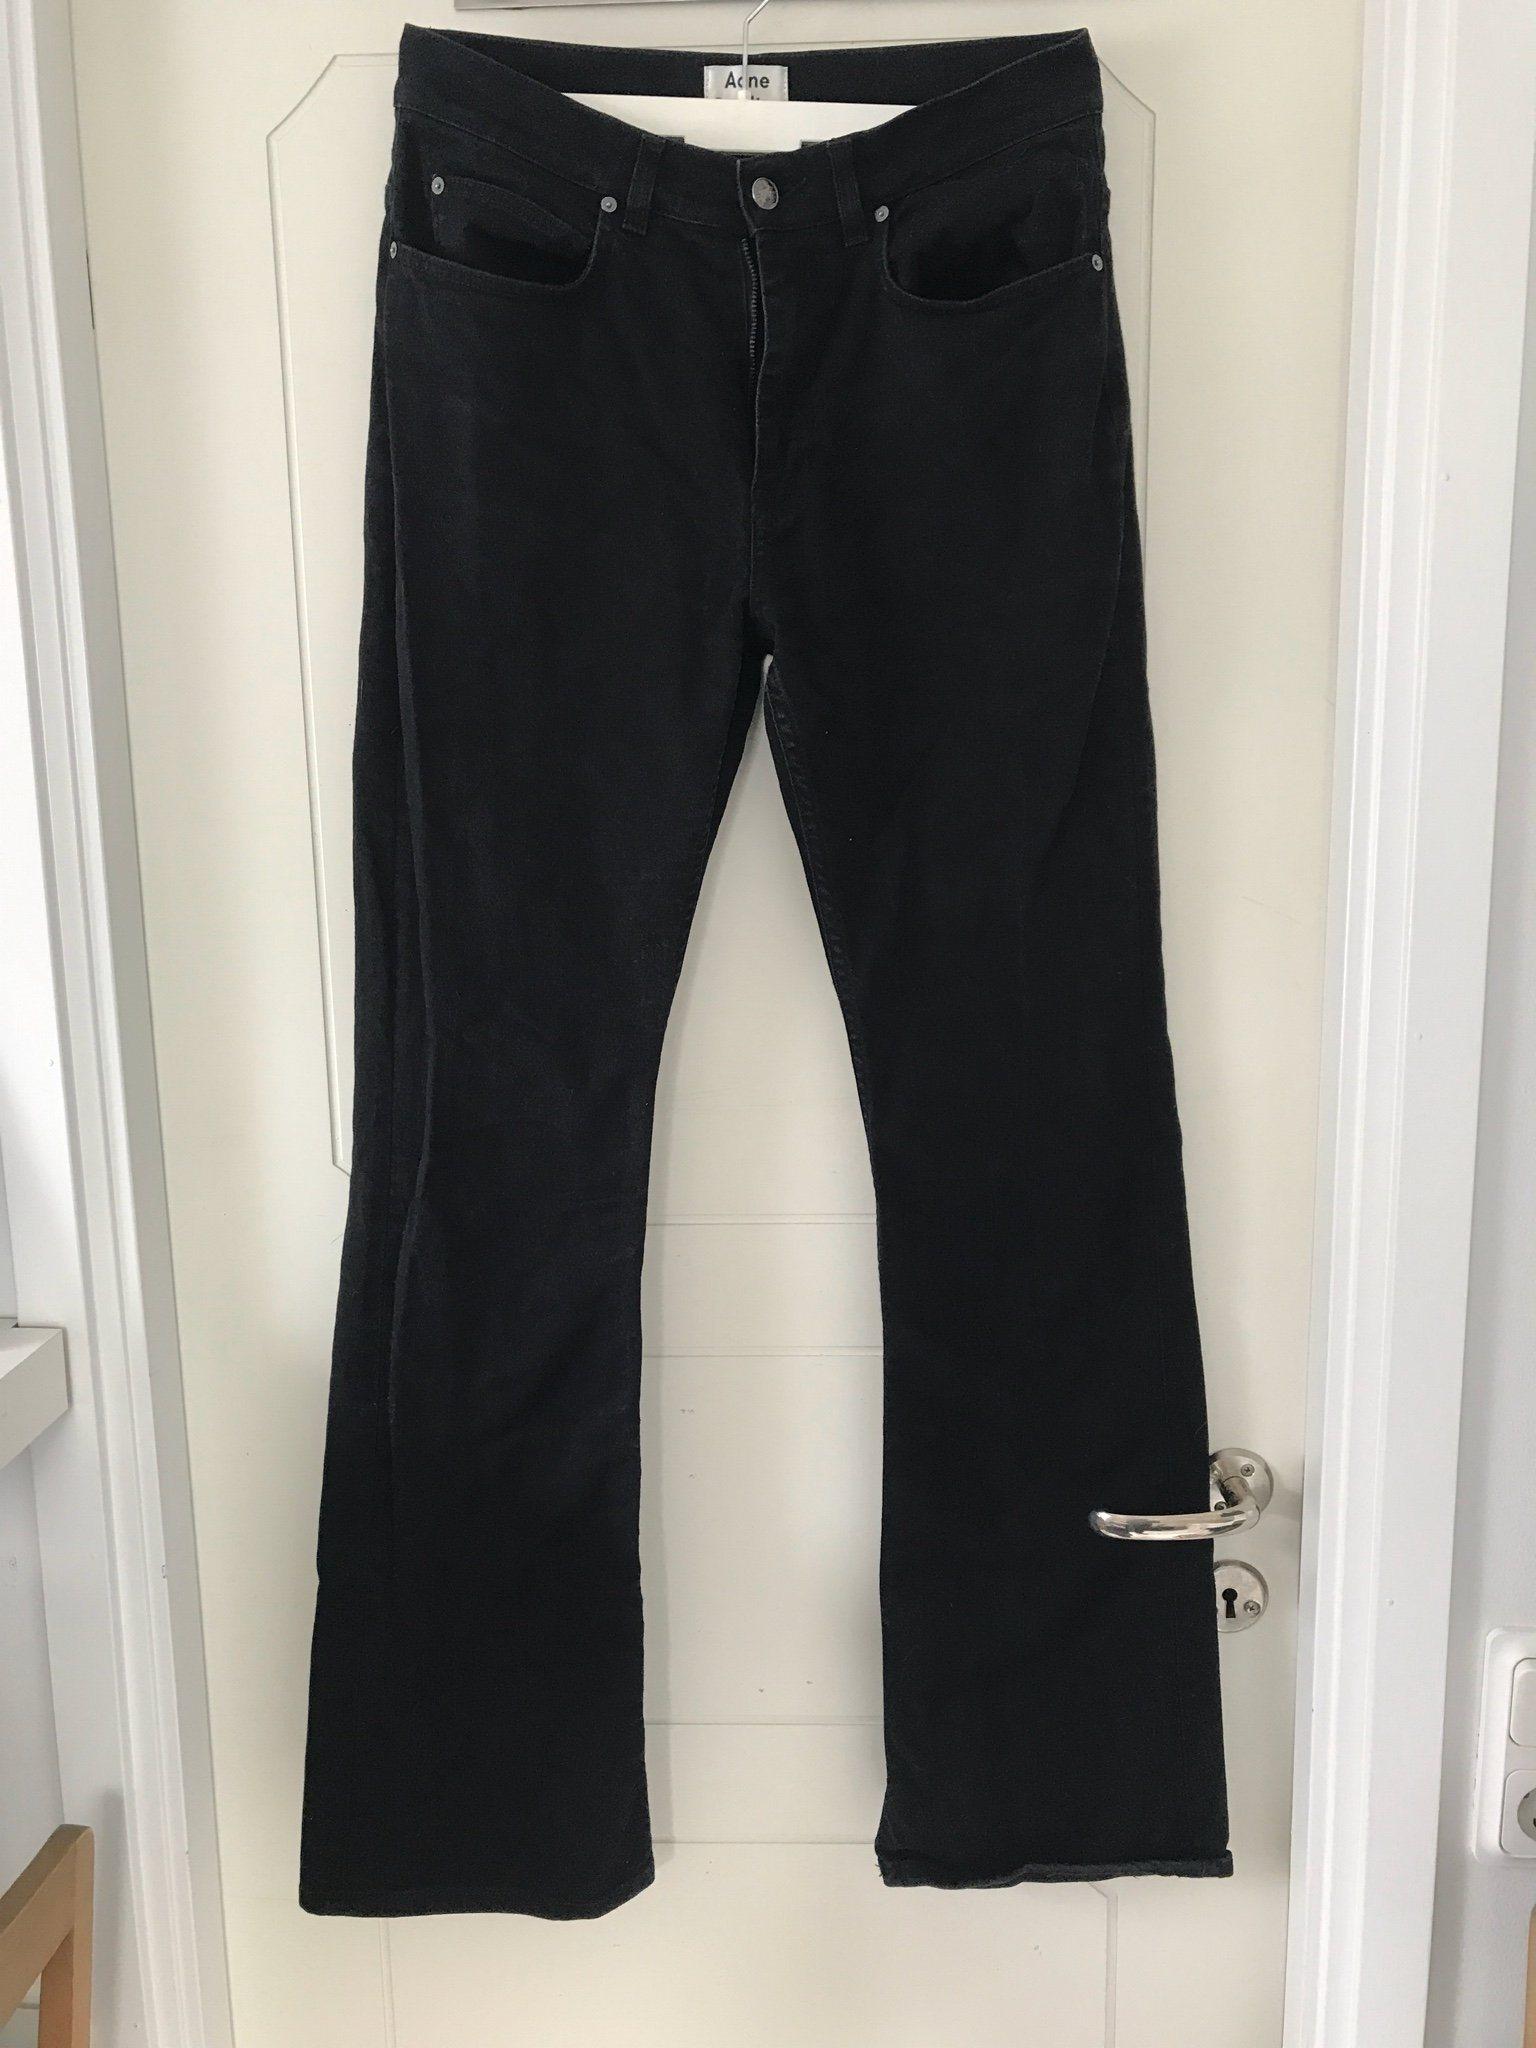 acne svarta jeans